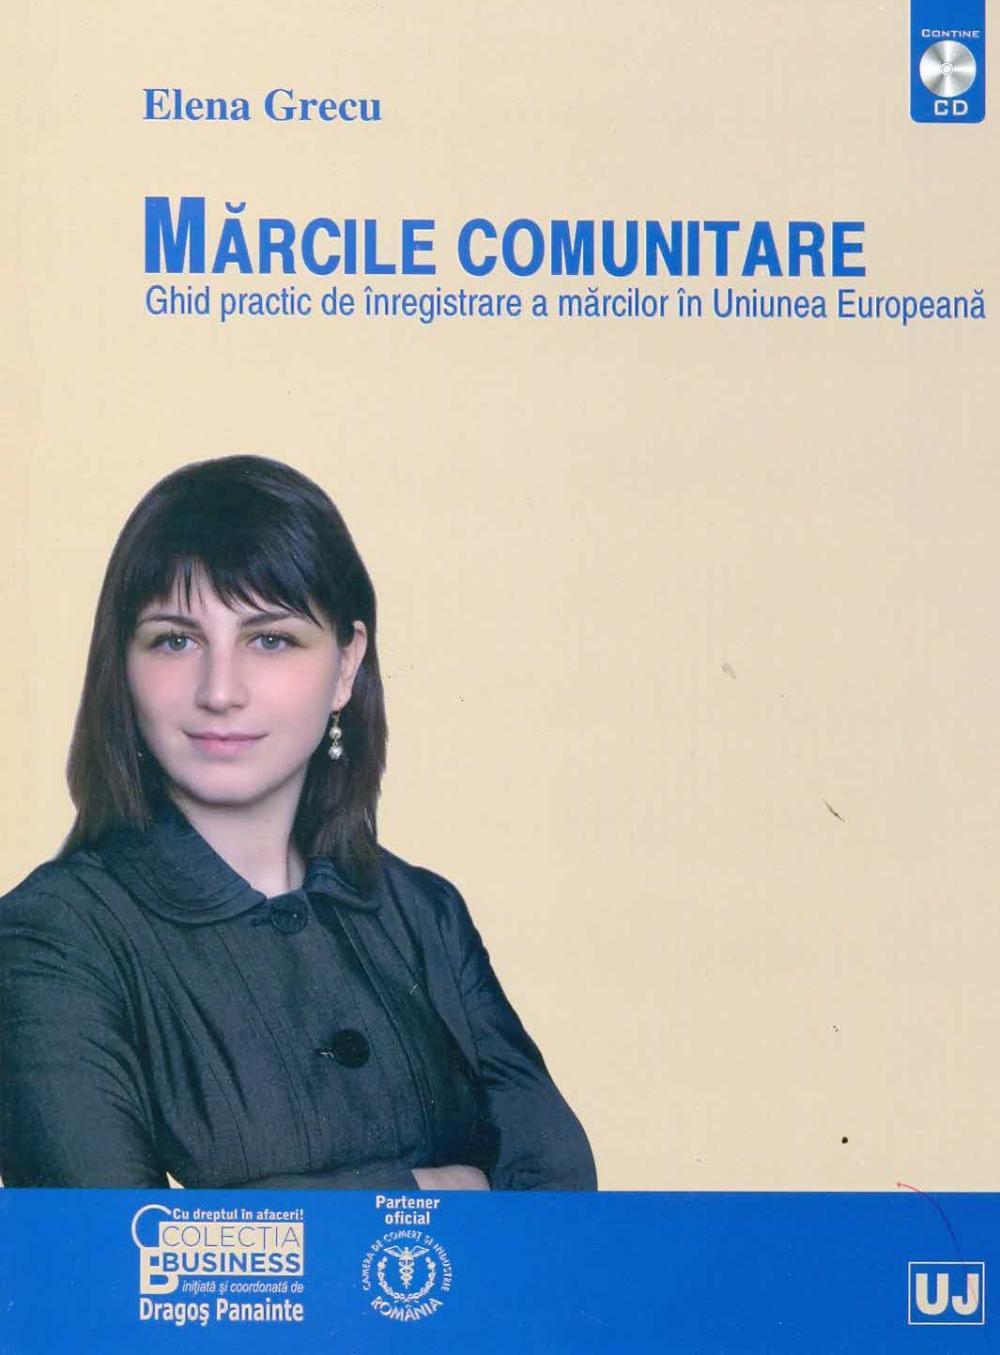 MARCILE COMUNITARE. GHID PRACTIC DE INREGISTRARE A MARCILOR IN UNIUNEA EUROPEANA